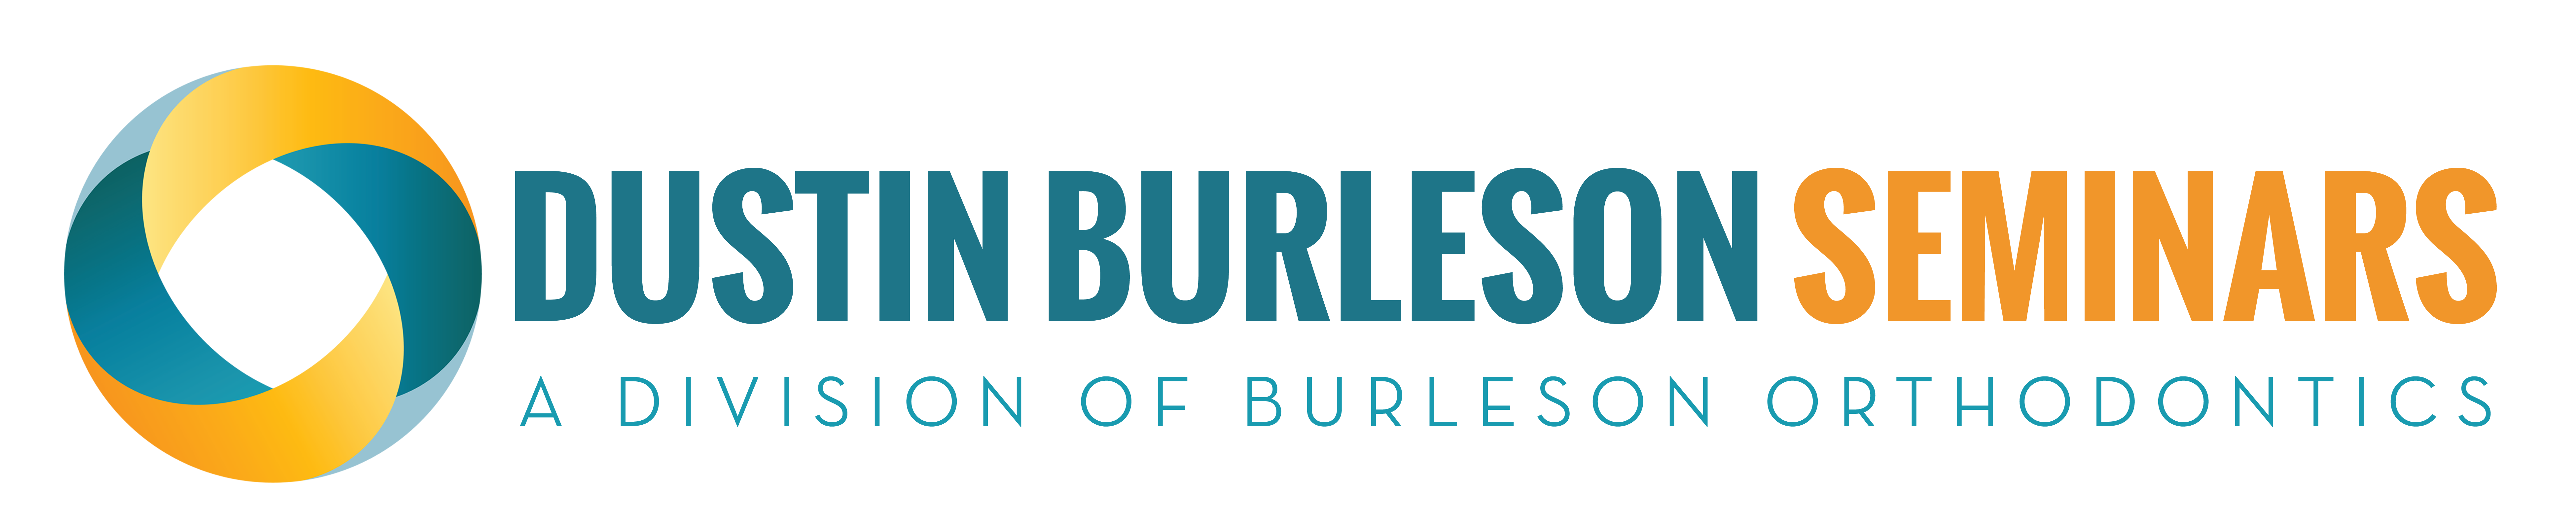 Burleson Seminars